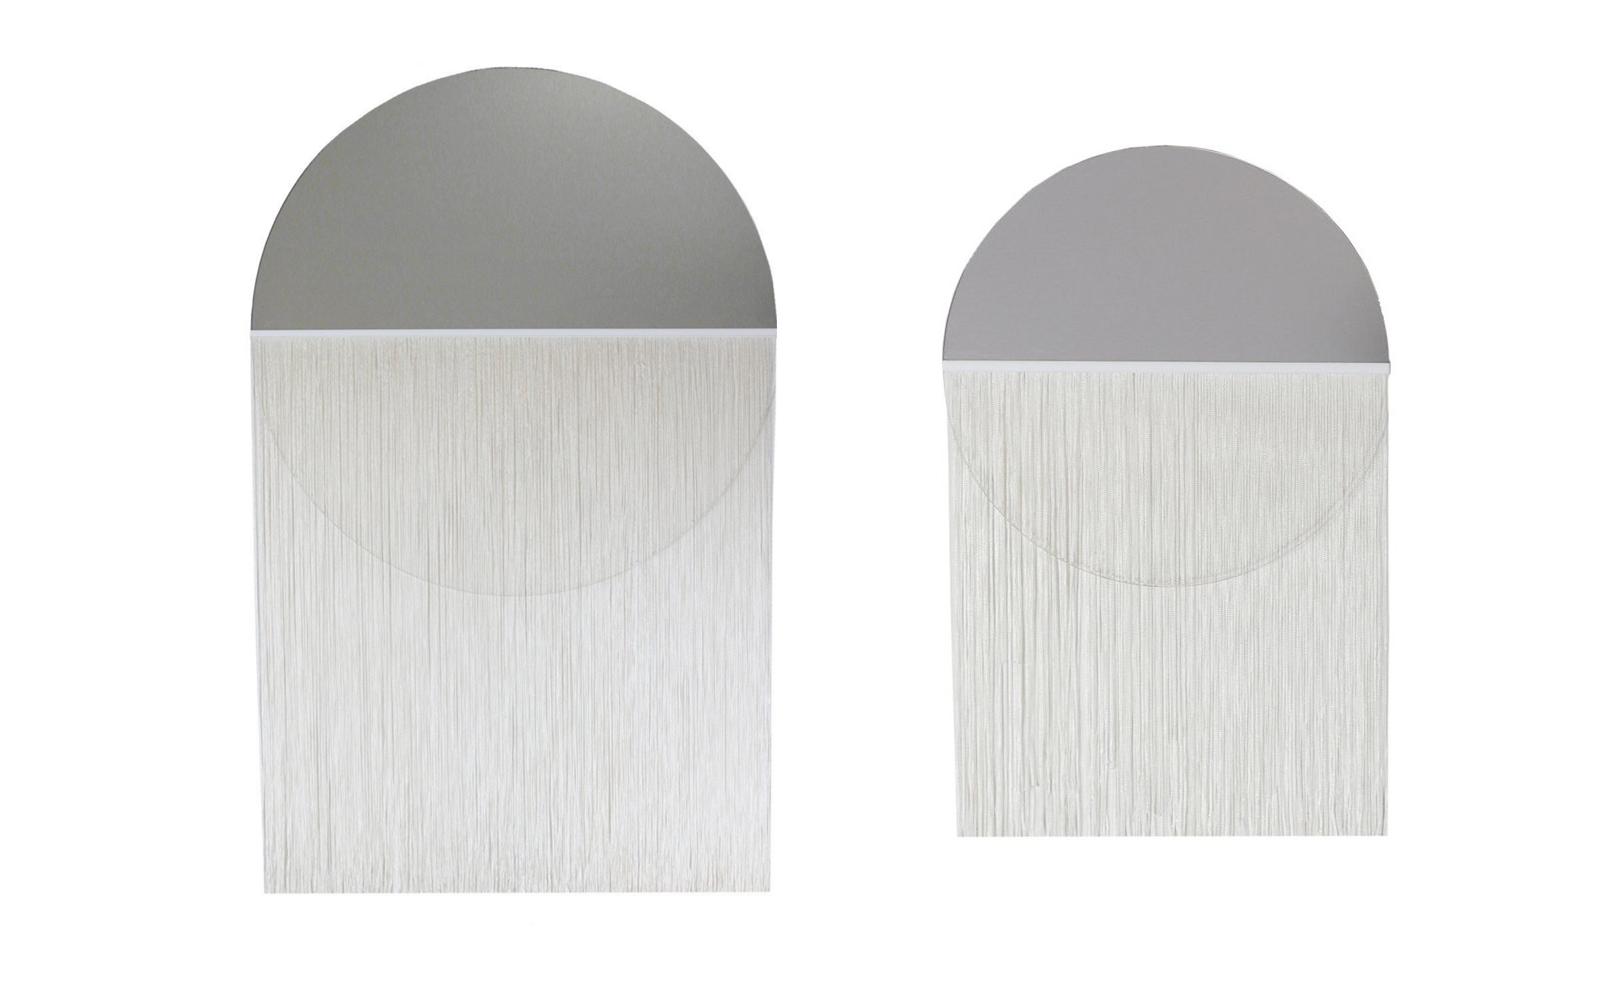 Shadow mirrored wall hanging by  Fazeek